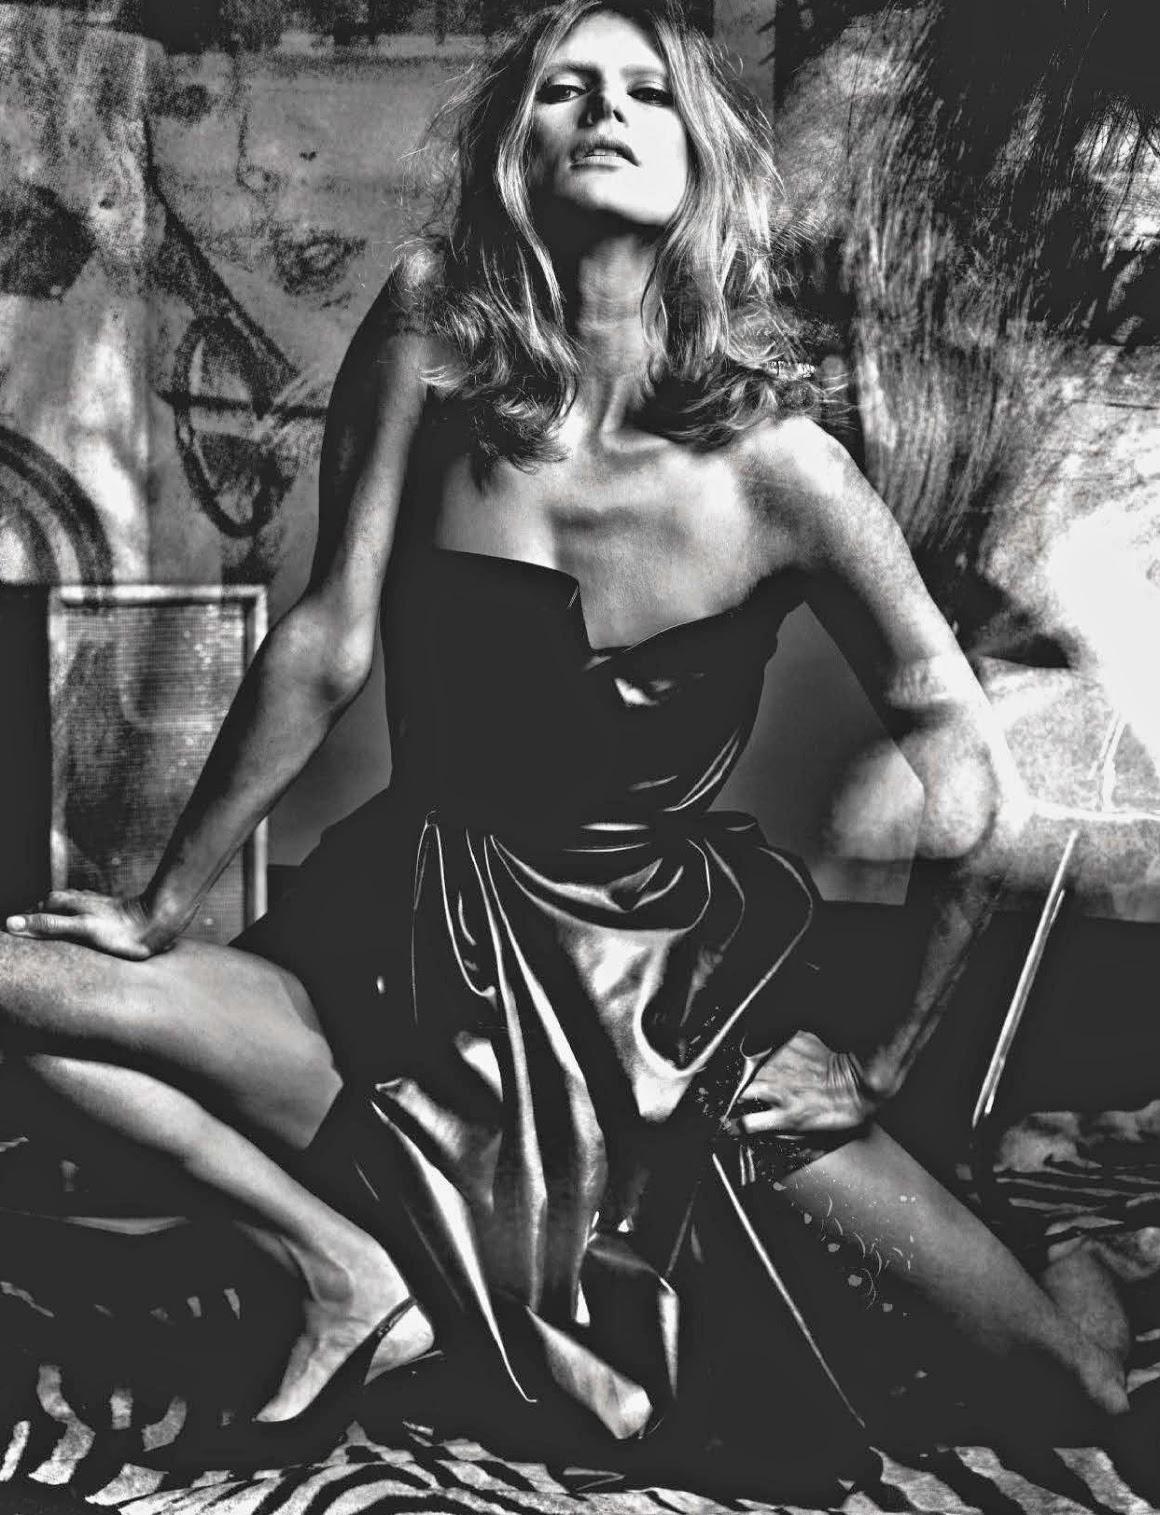 Thin model Vogue Italia